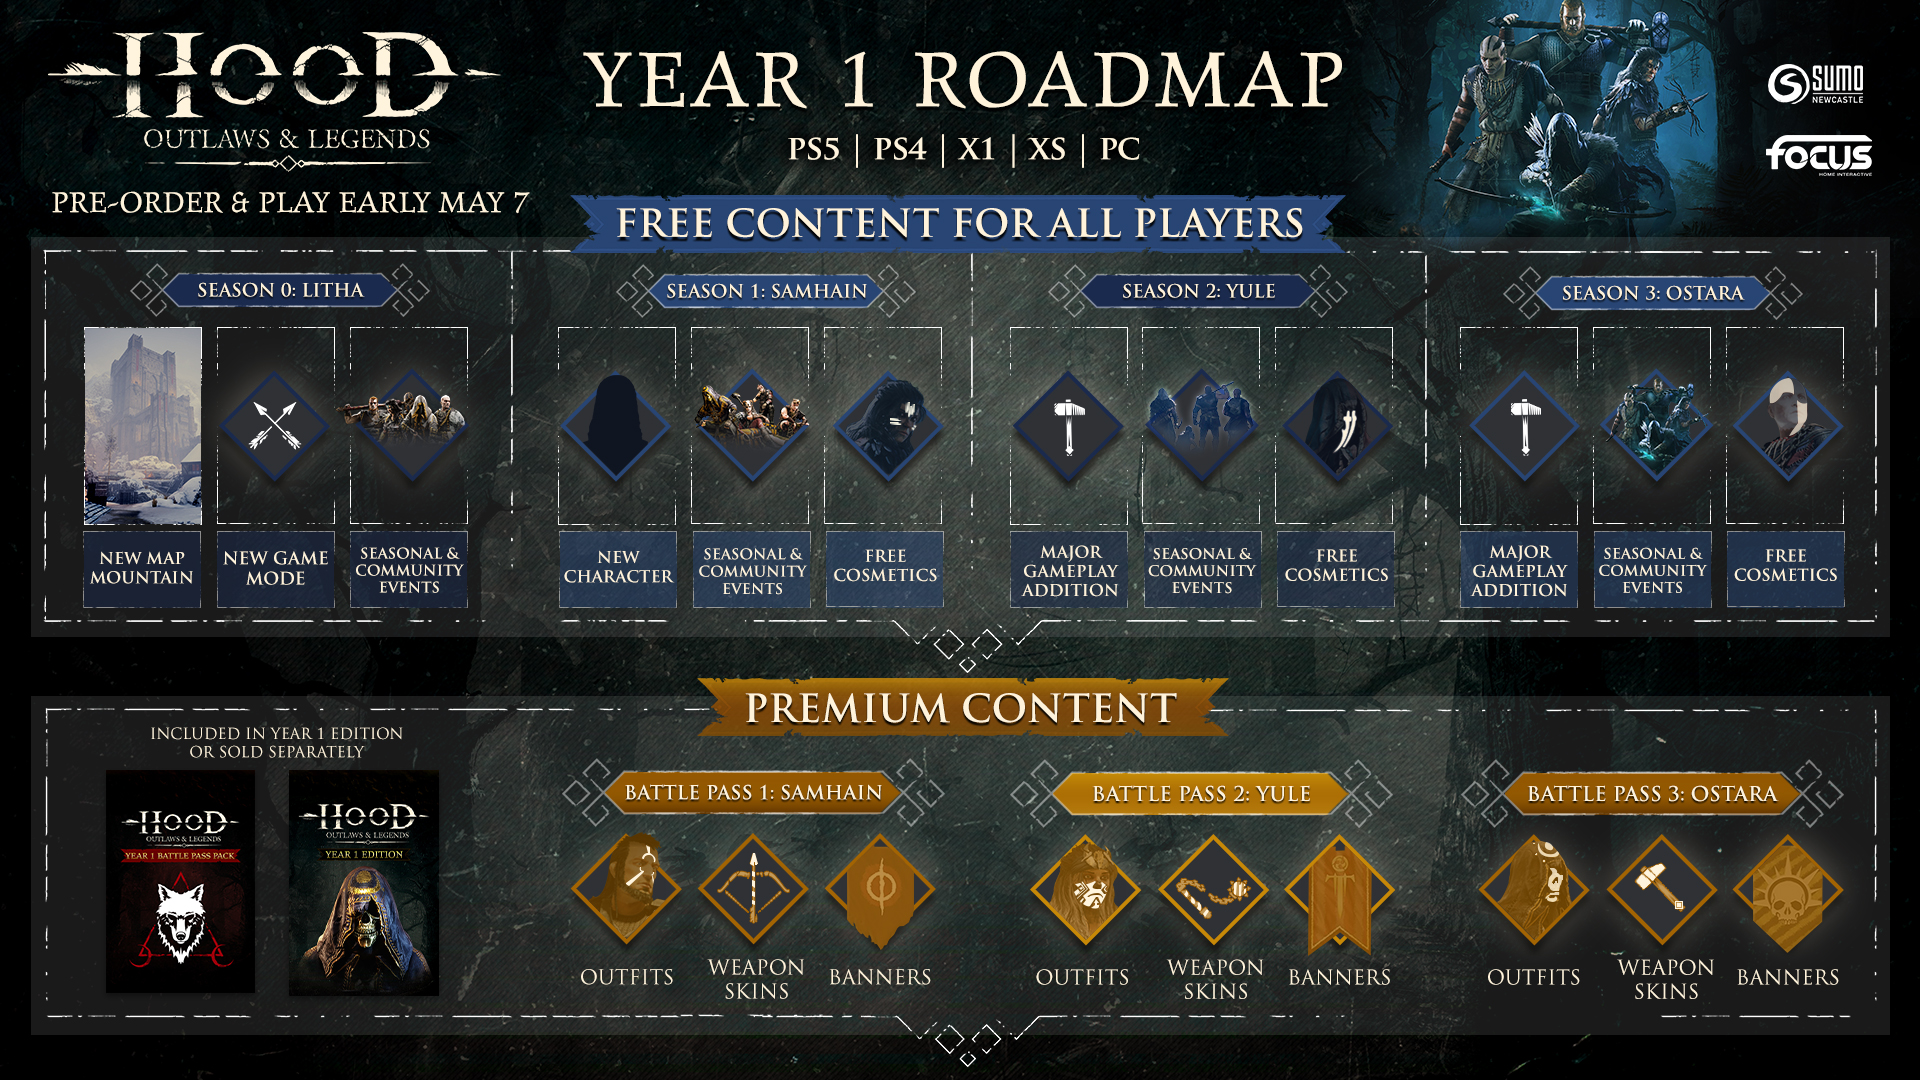 Hood Outlaws & Legends Year 1 Roadmap